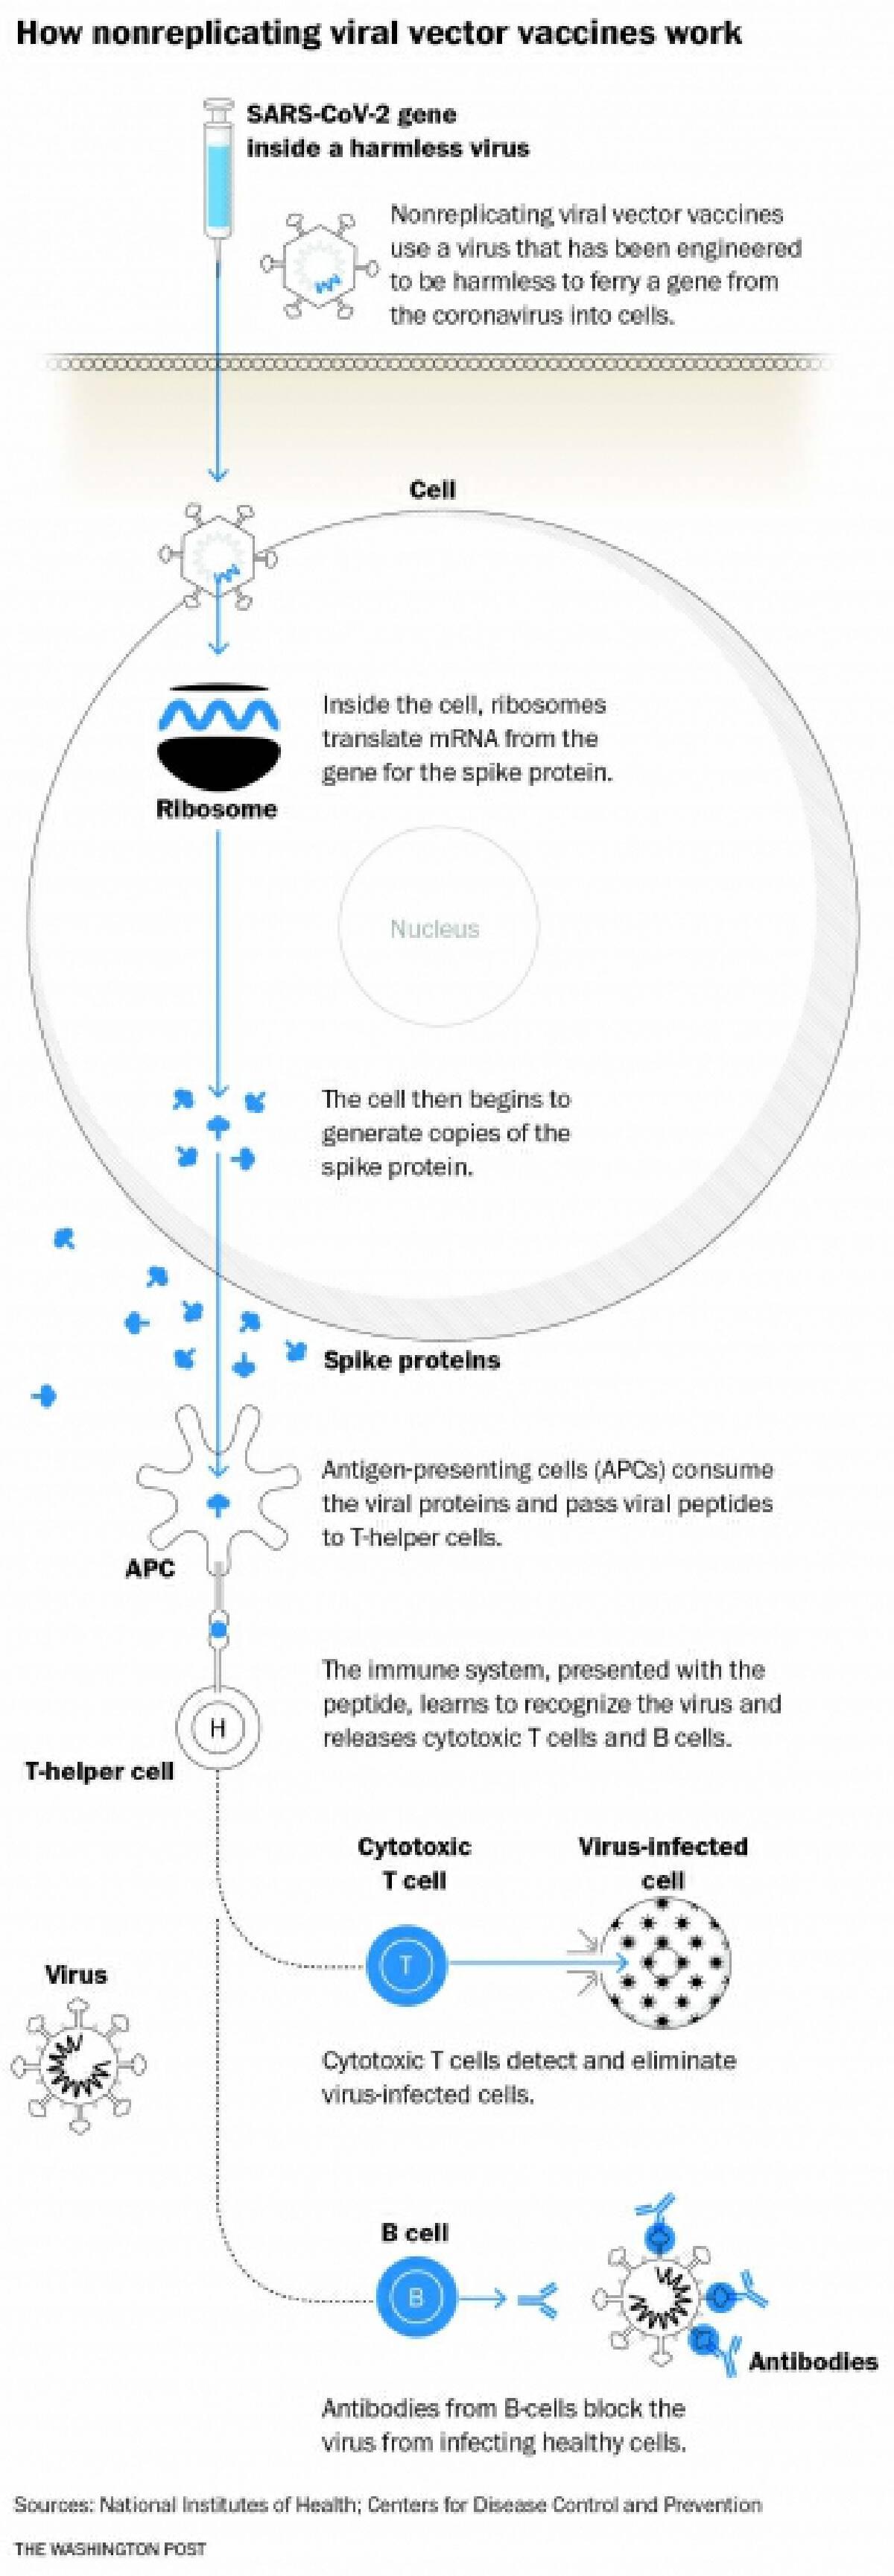 Merck will help make Johnson & Johnson coronavirus vaccine as rivals team up to help Biden accelerate shots